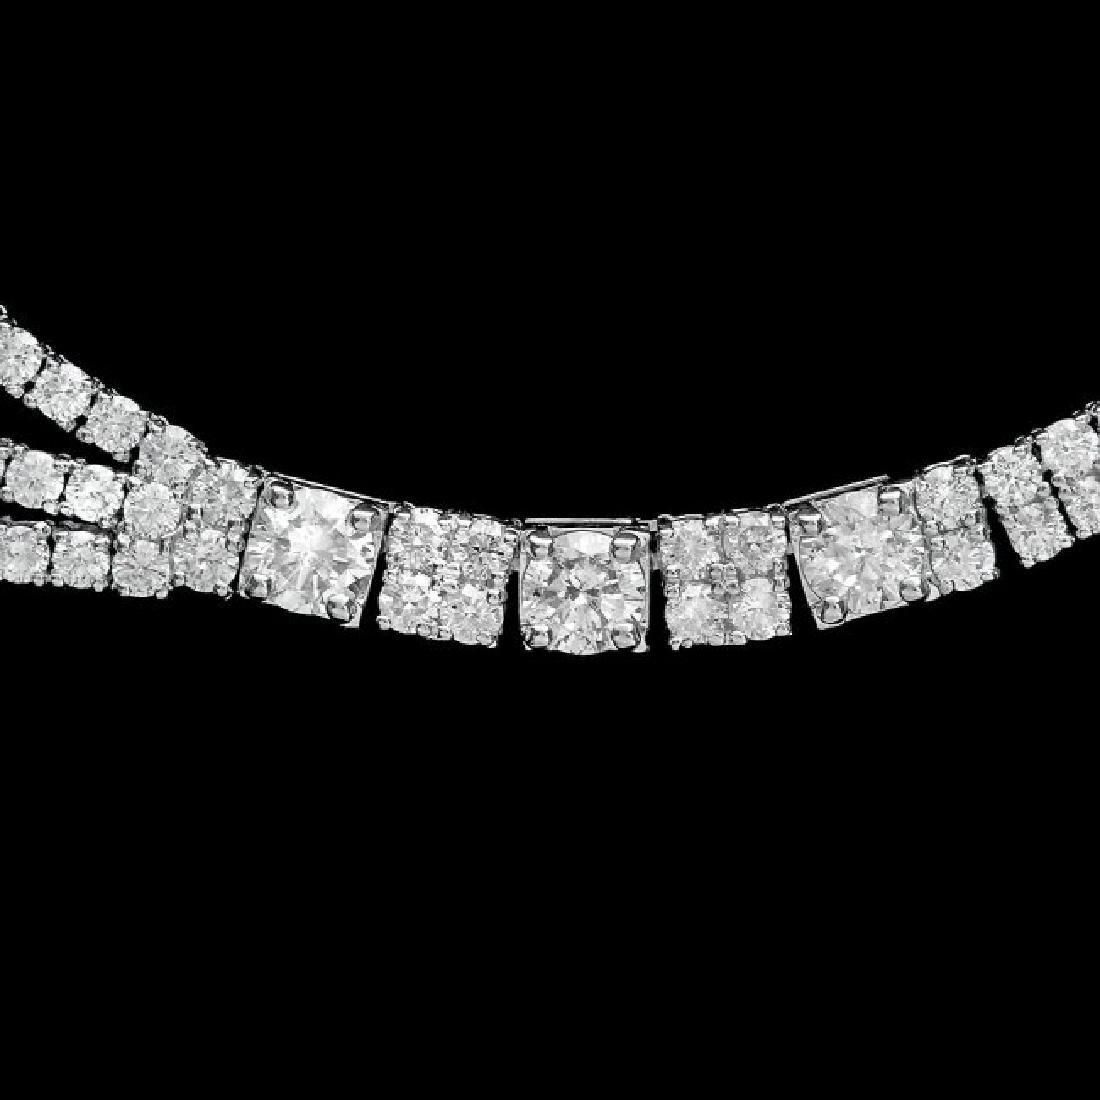 18k White Gold 23.10ct Diamond Necklace - 4